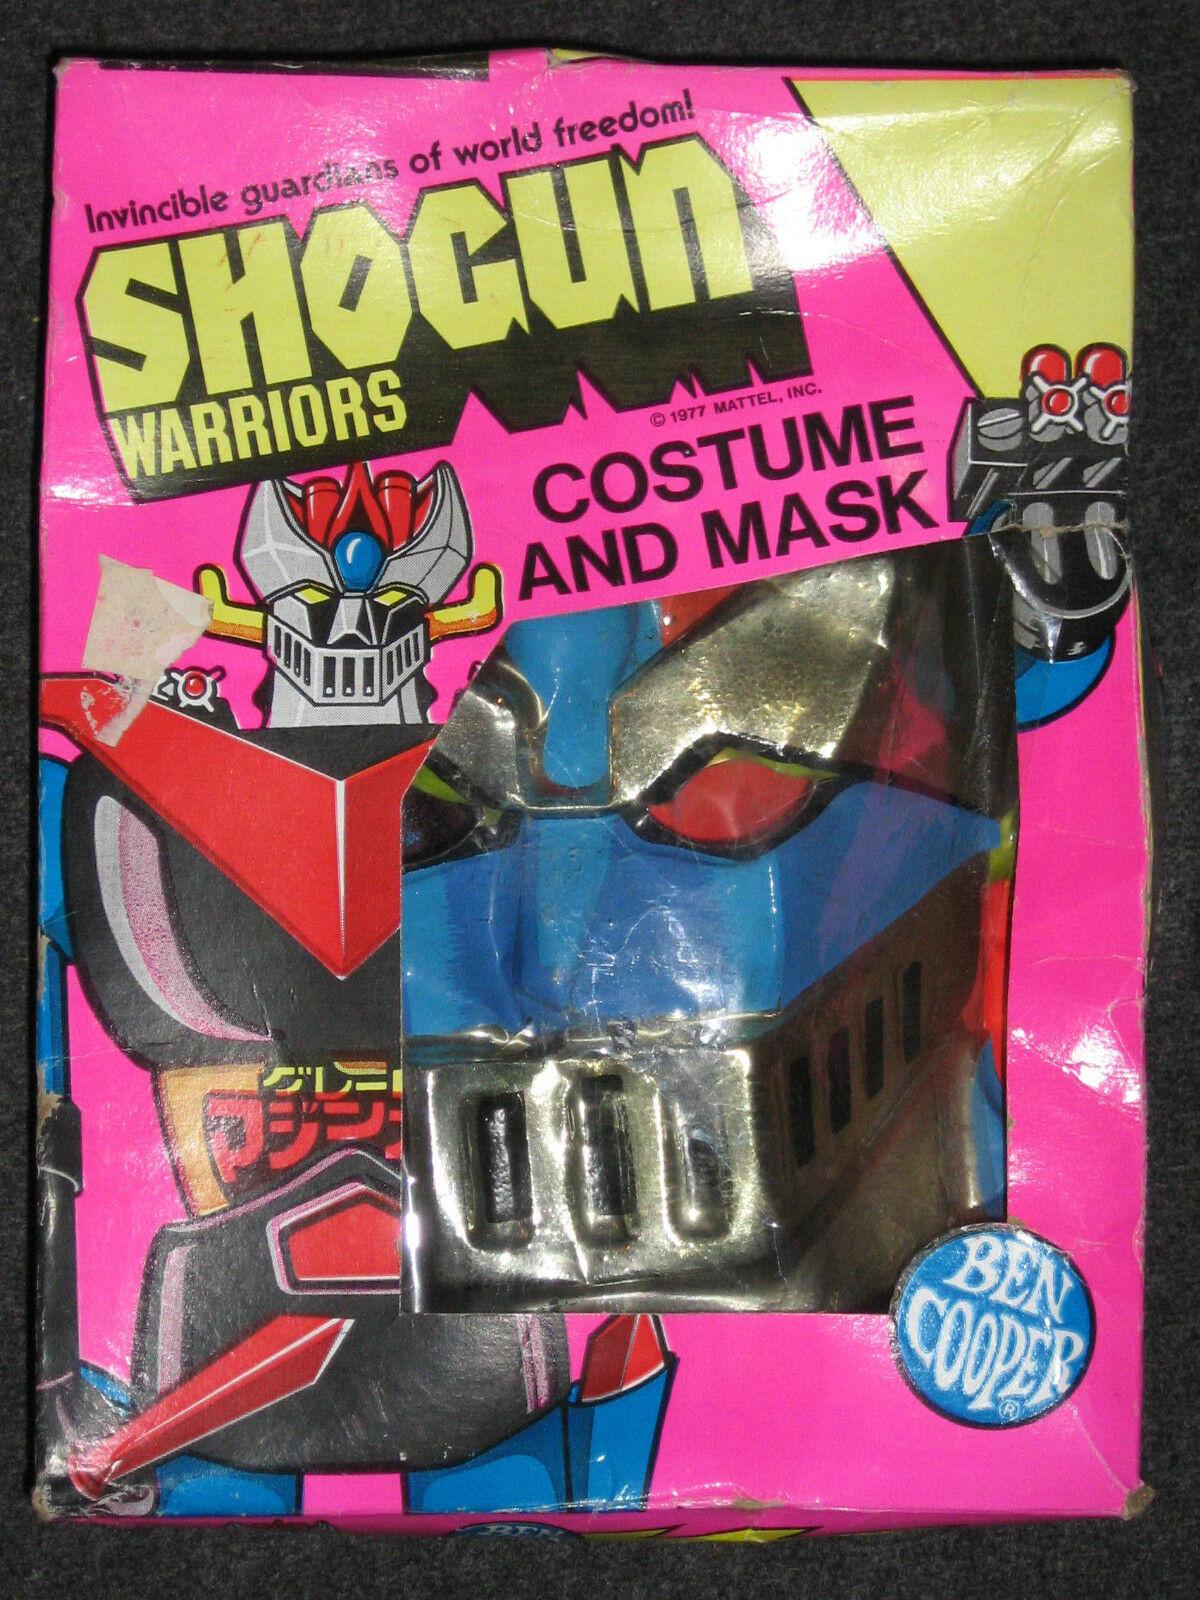 Grande mazinga mazinger costume carnevale robot ben cooper mattel